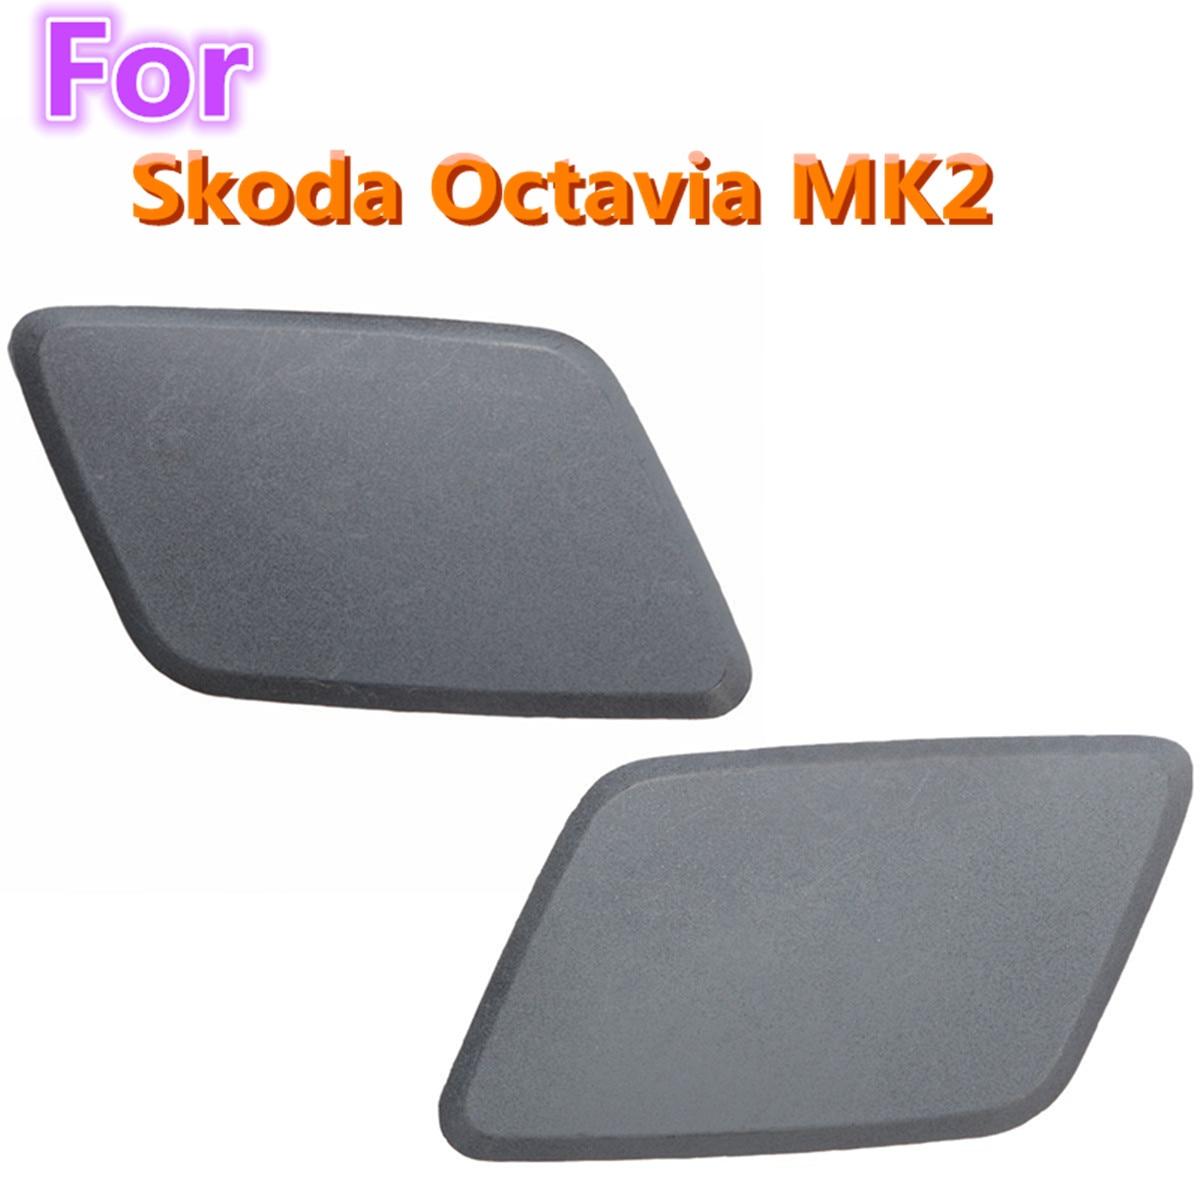 2pcs Car Left Right Headlight Washer Nozzle Jet Cover Cap for Skoda Octavia MK2 N S F